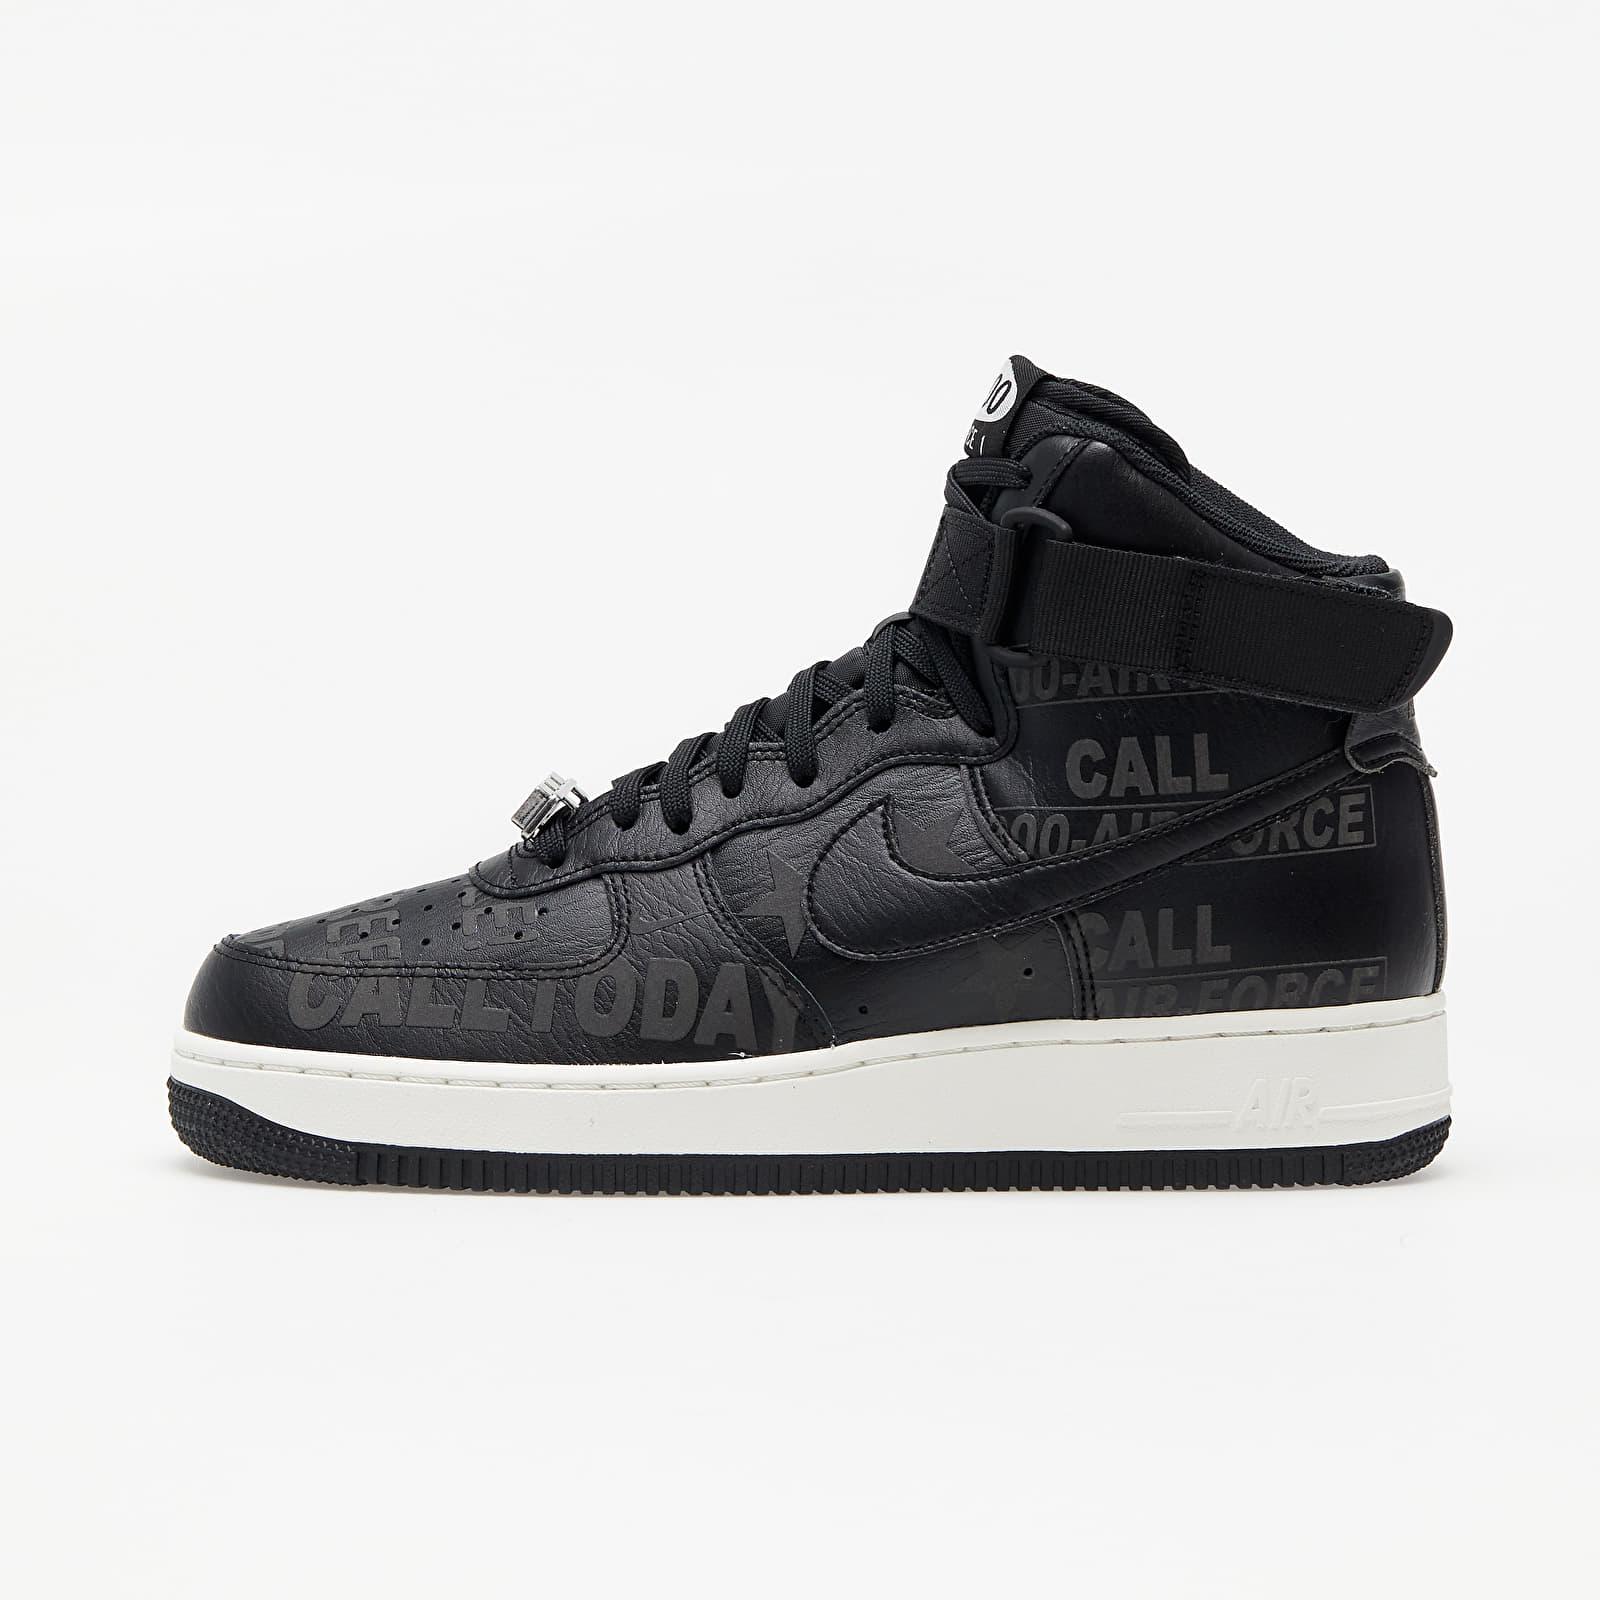 Pánské tenisky a boty Nike Air Force 1 High '07 Premium Black/ Black-Sail-Vast Grey